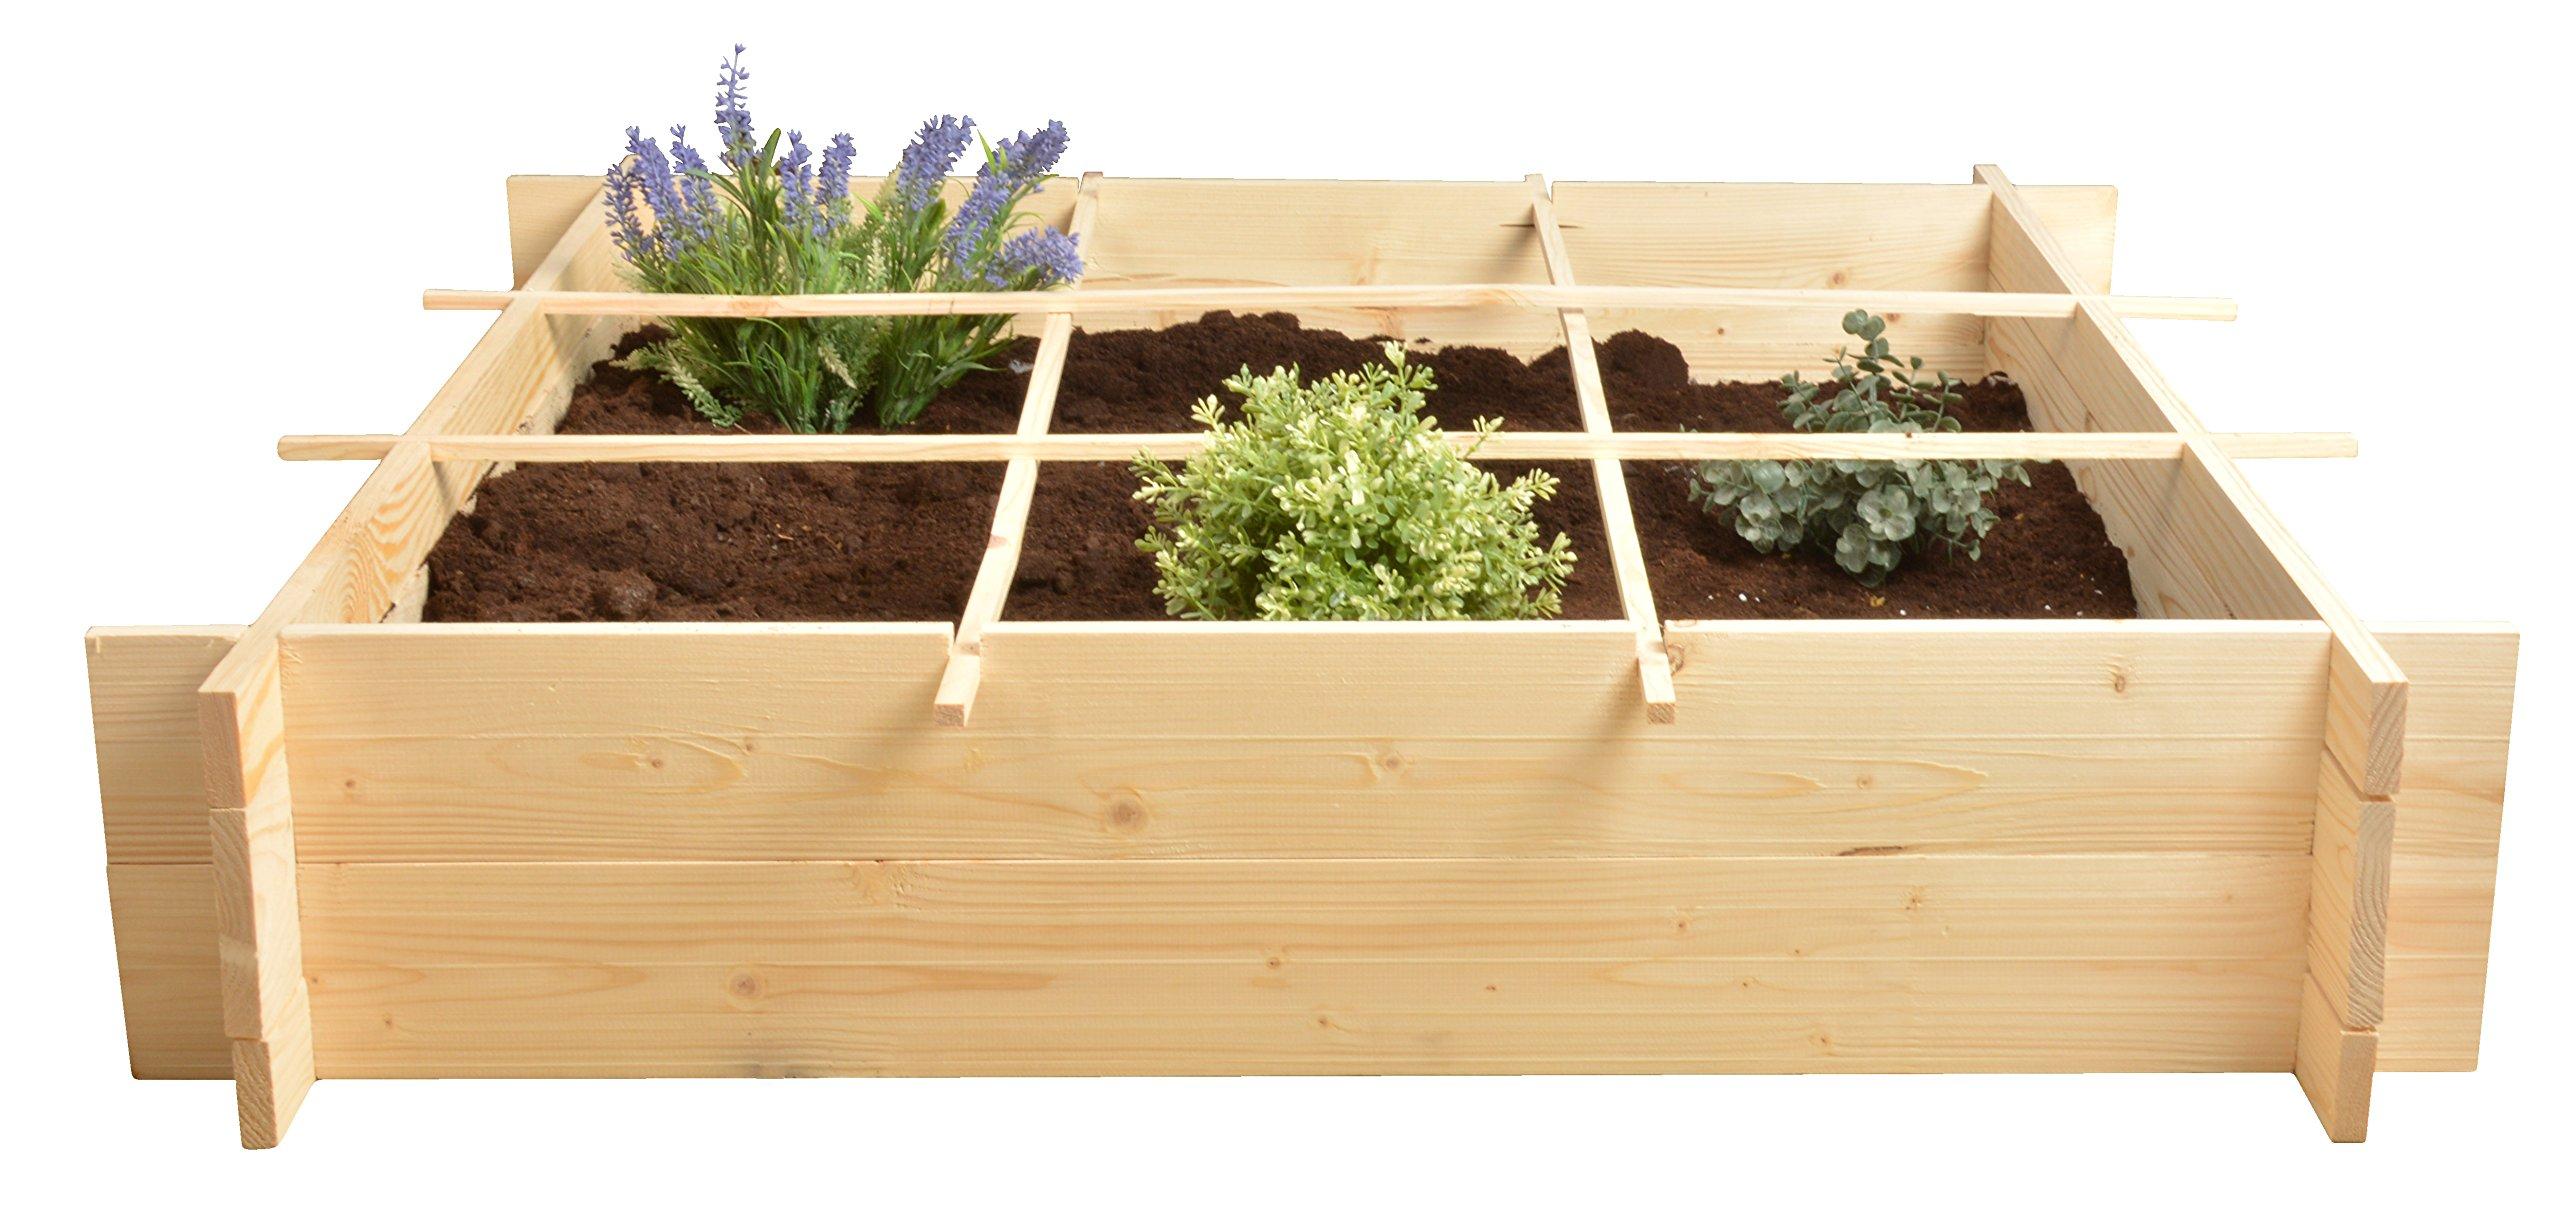 Esschert Design B1012 Wooden Square Meter Garden